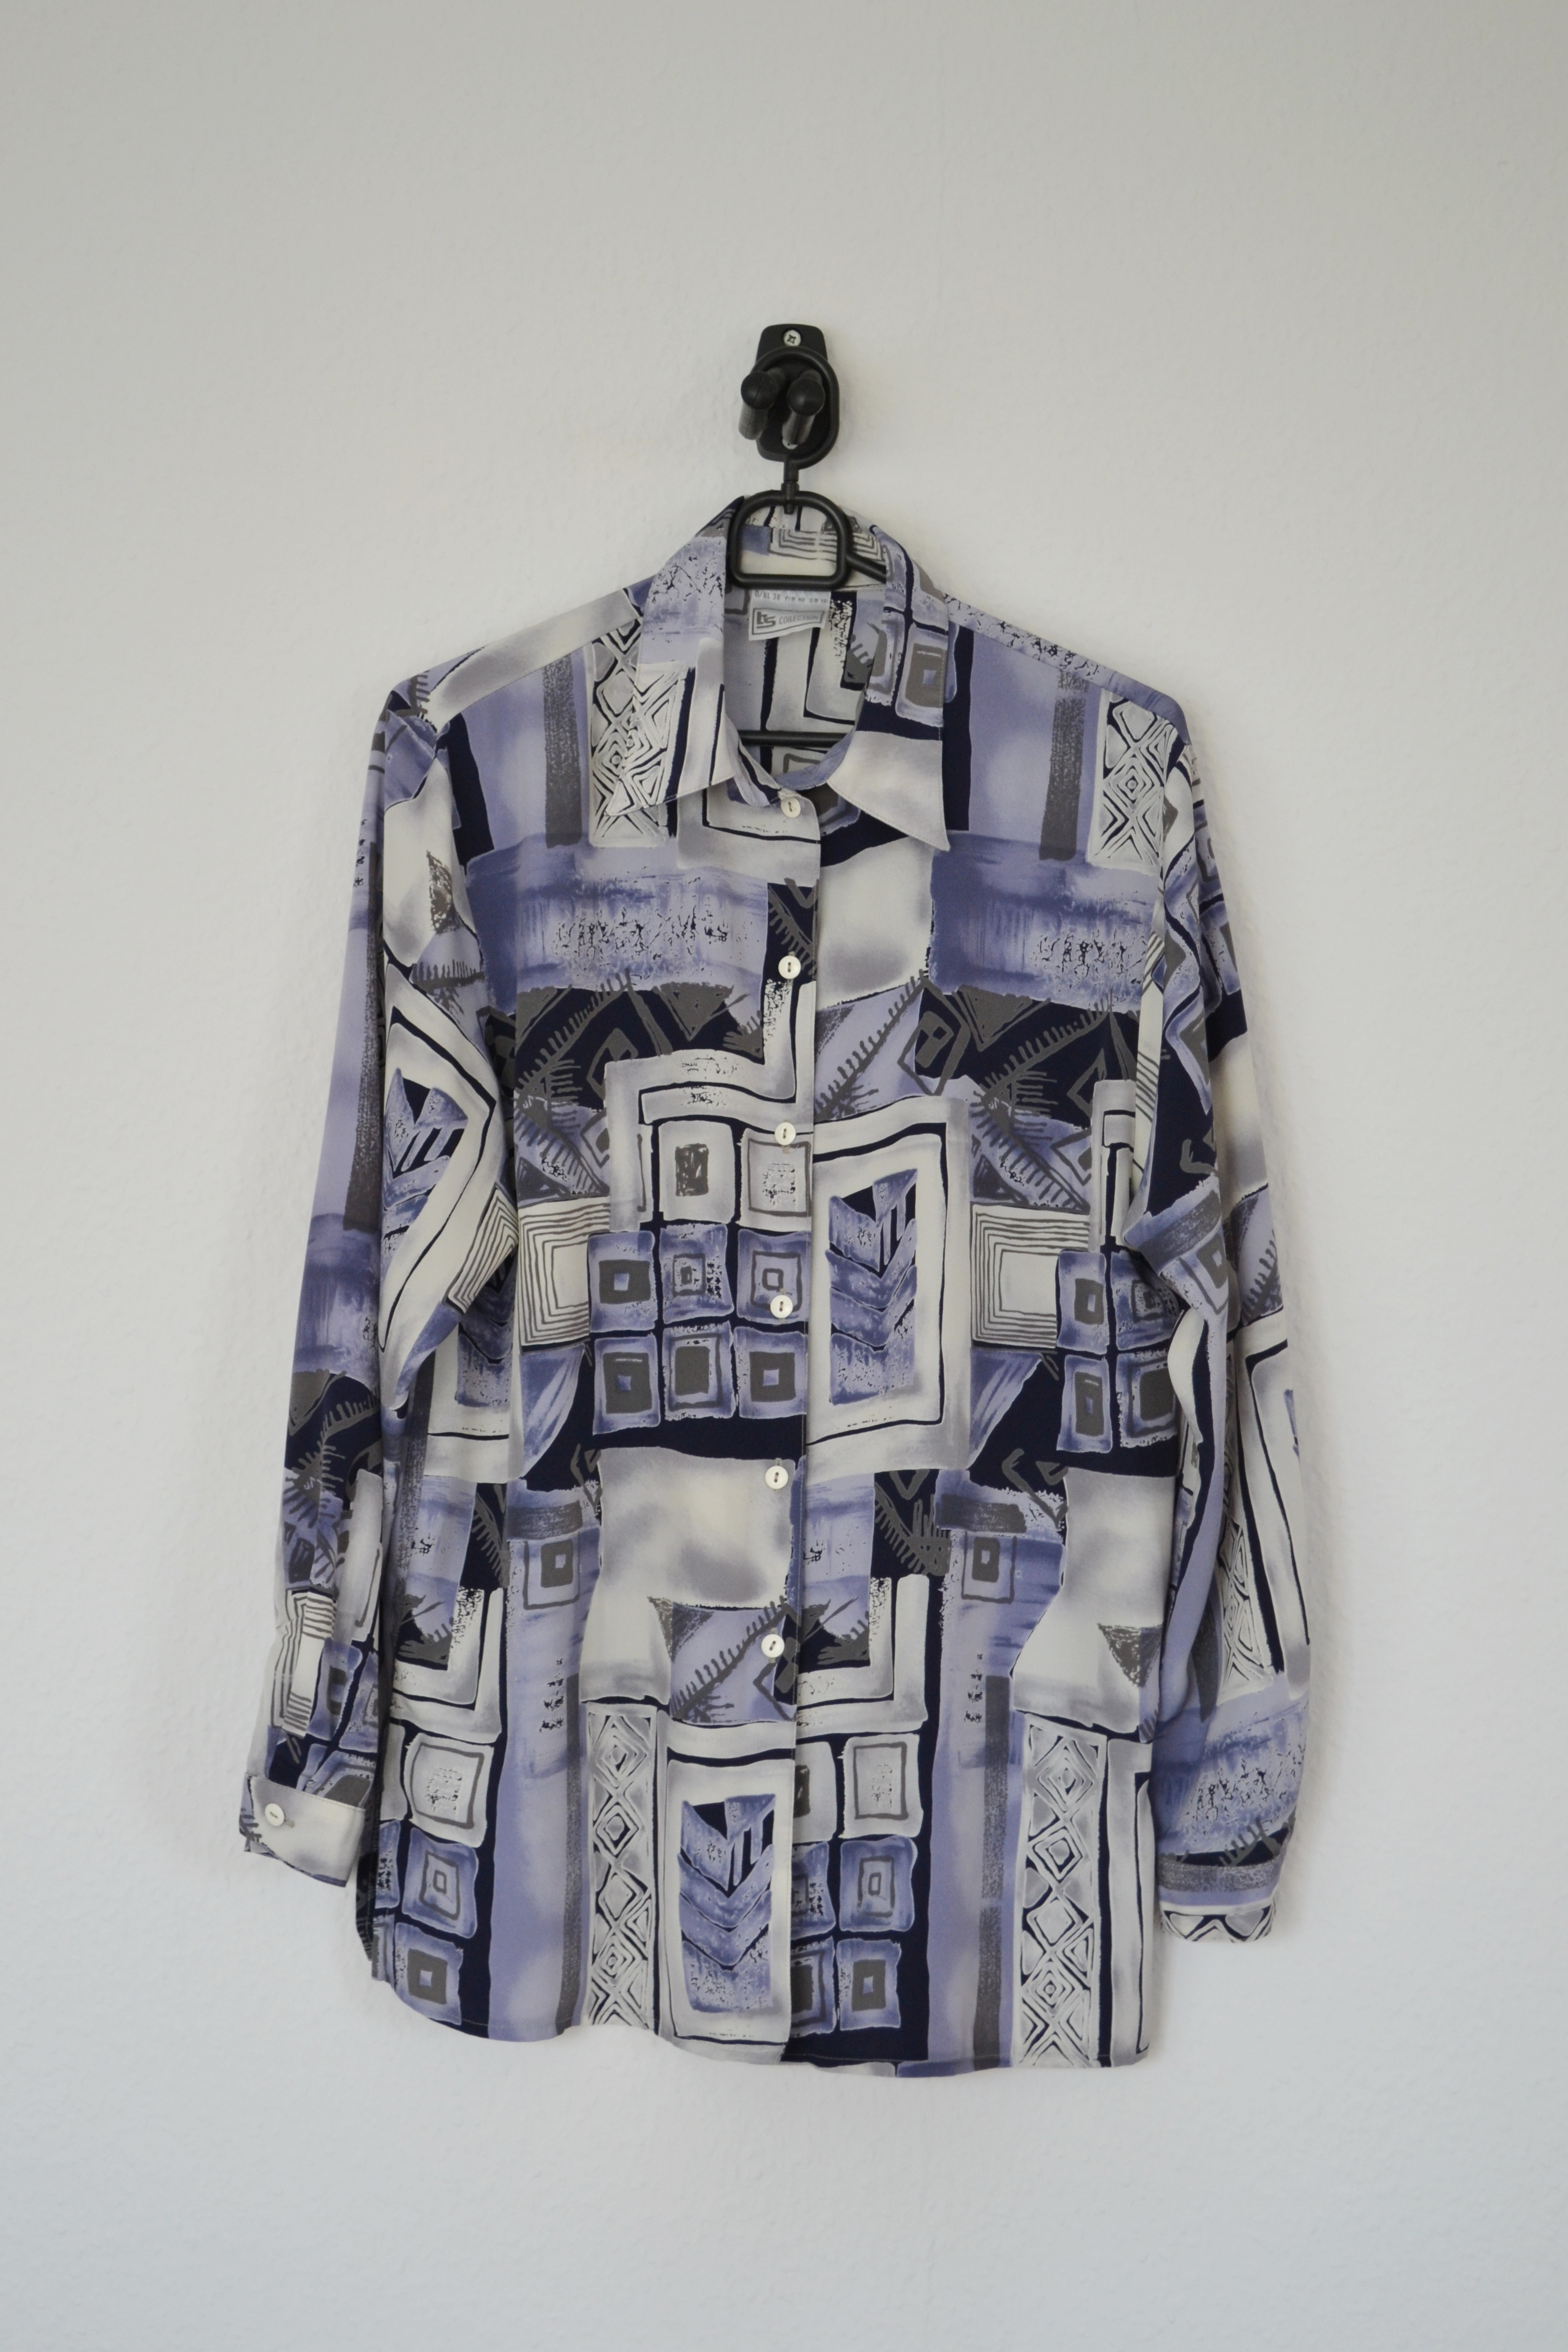 Periwinkle og grå mønstret skjorte - second hand